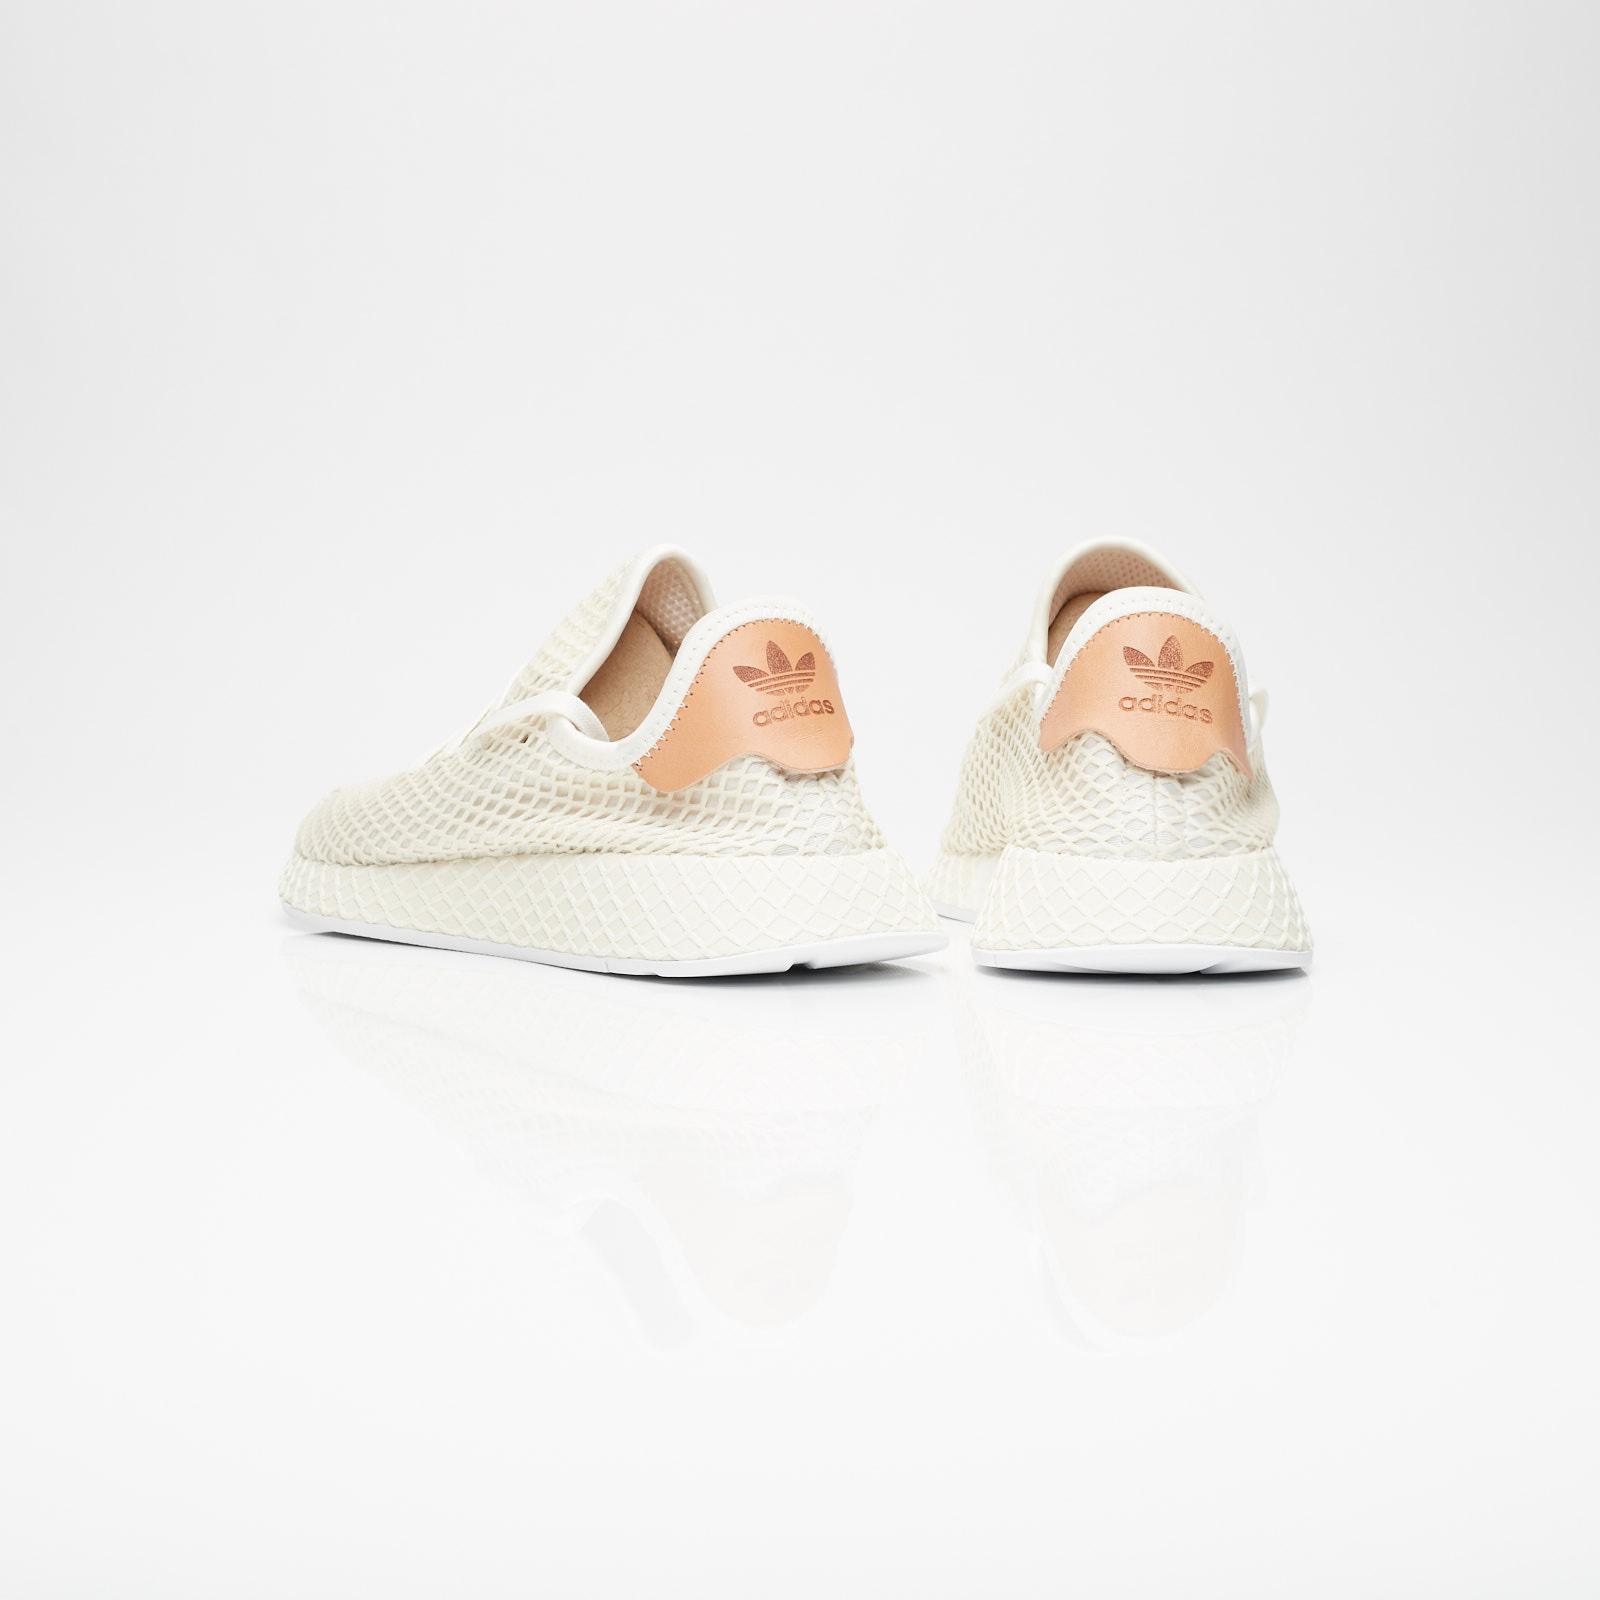 adidas Deerupt - B41759